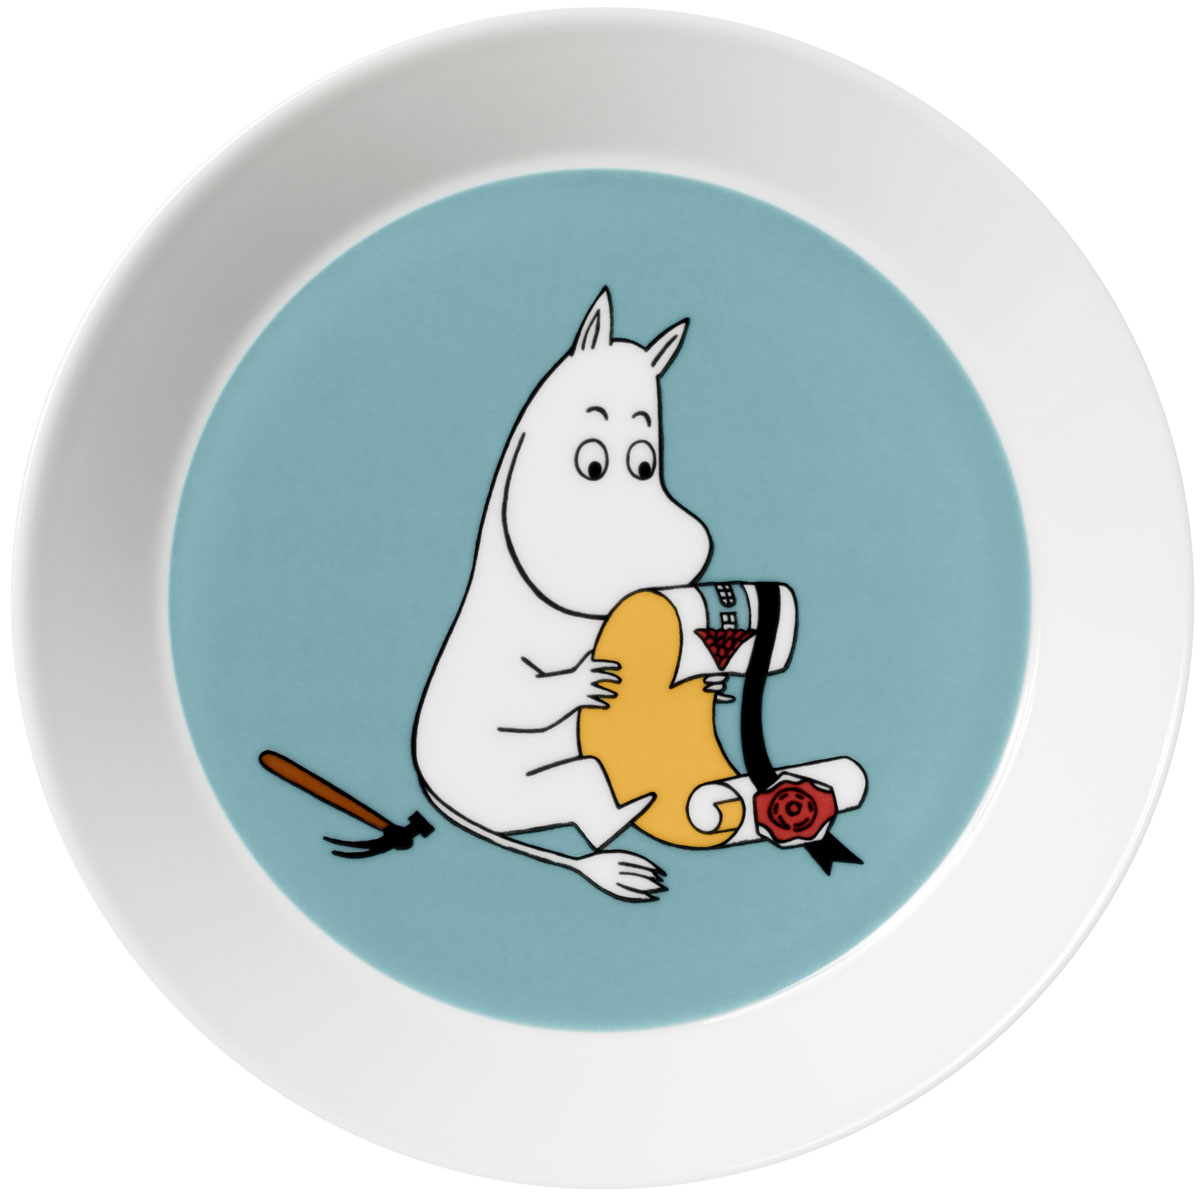 Тарелка Arabia Finland Муми-Тролль, цвет: бирюзовый, диаметр 19 см1006290